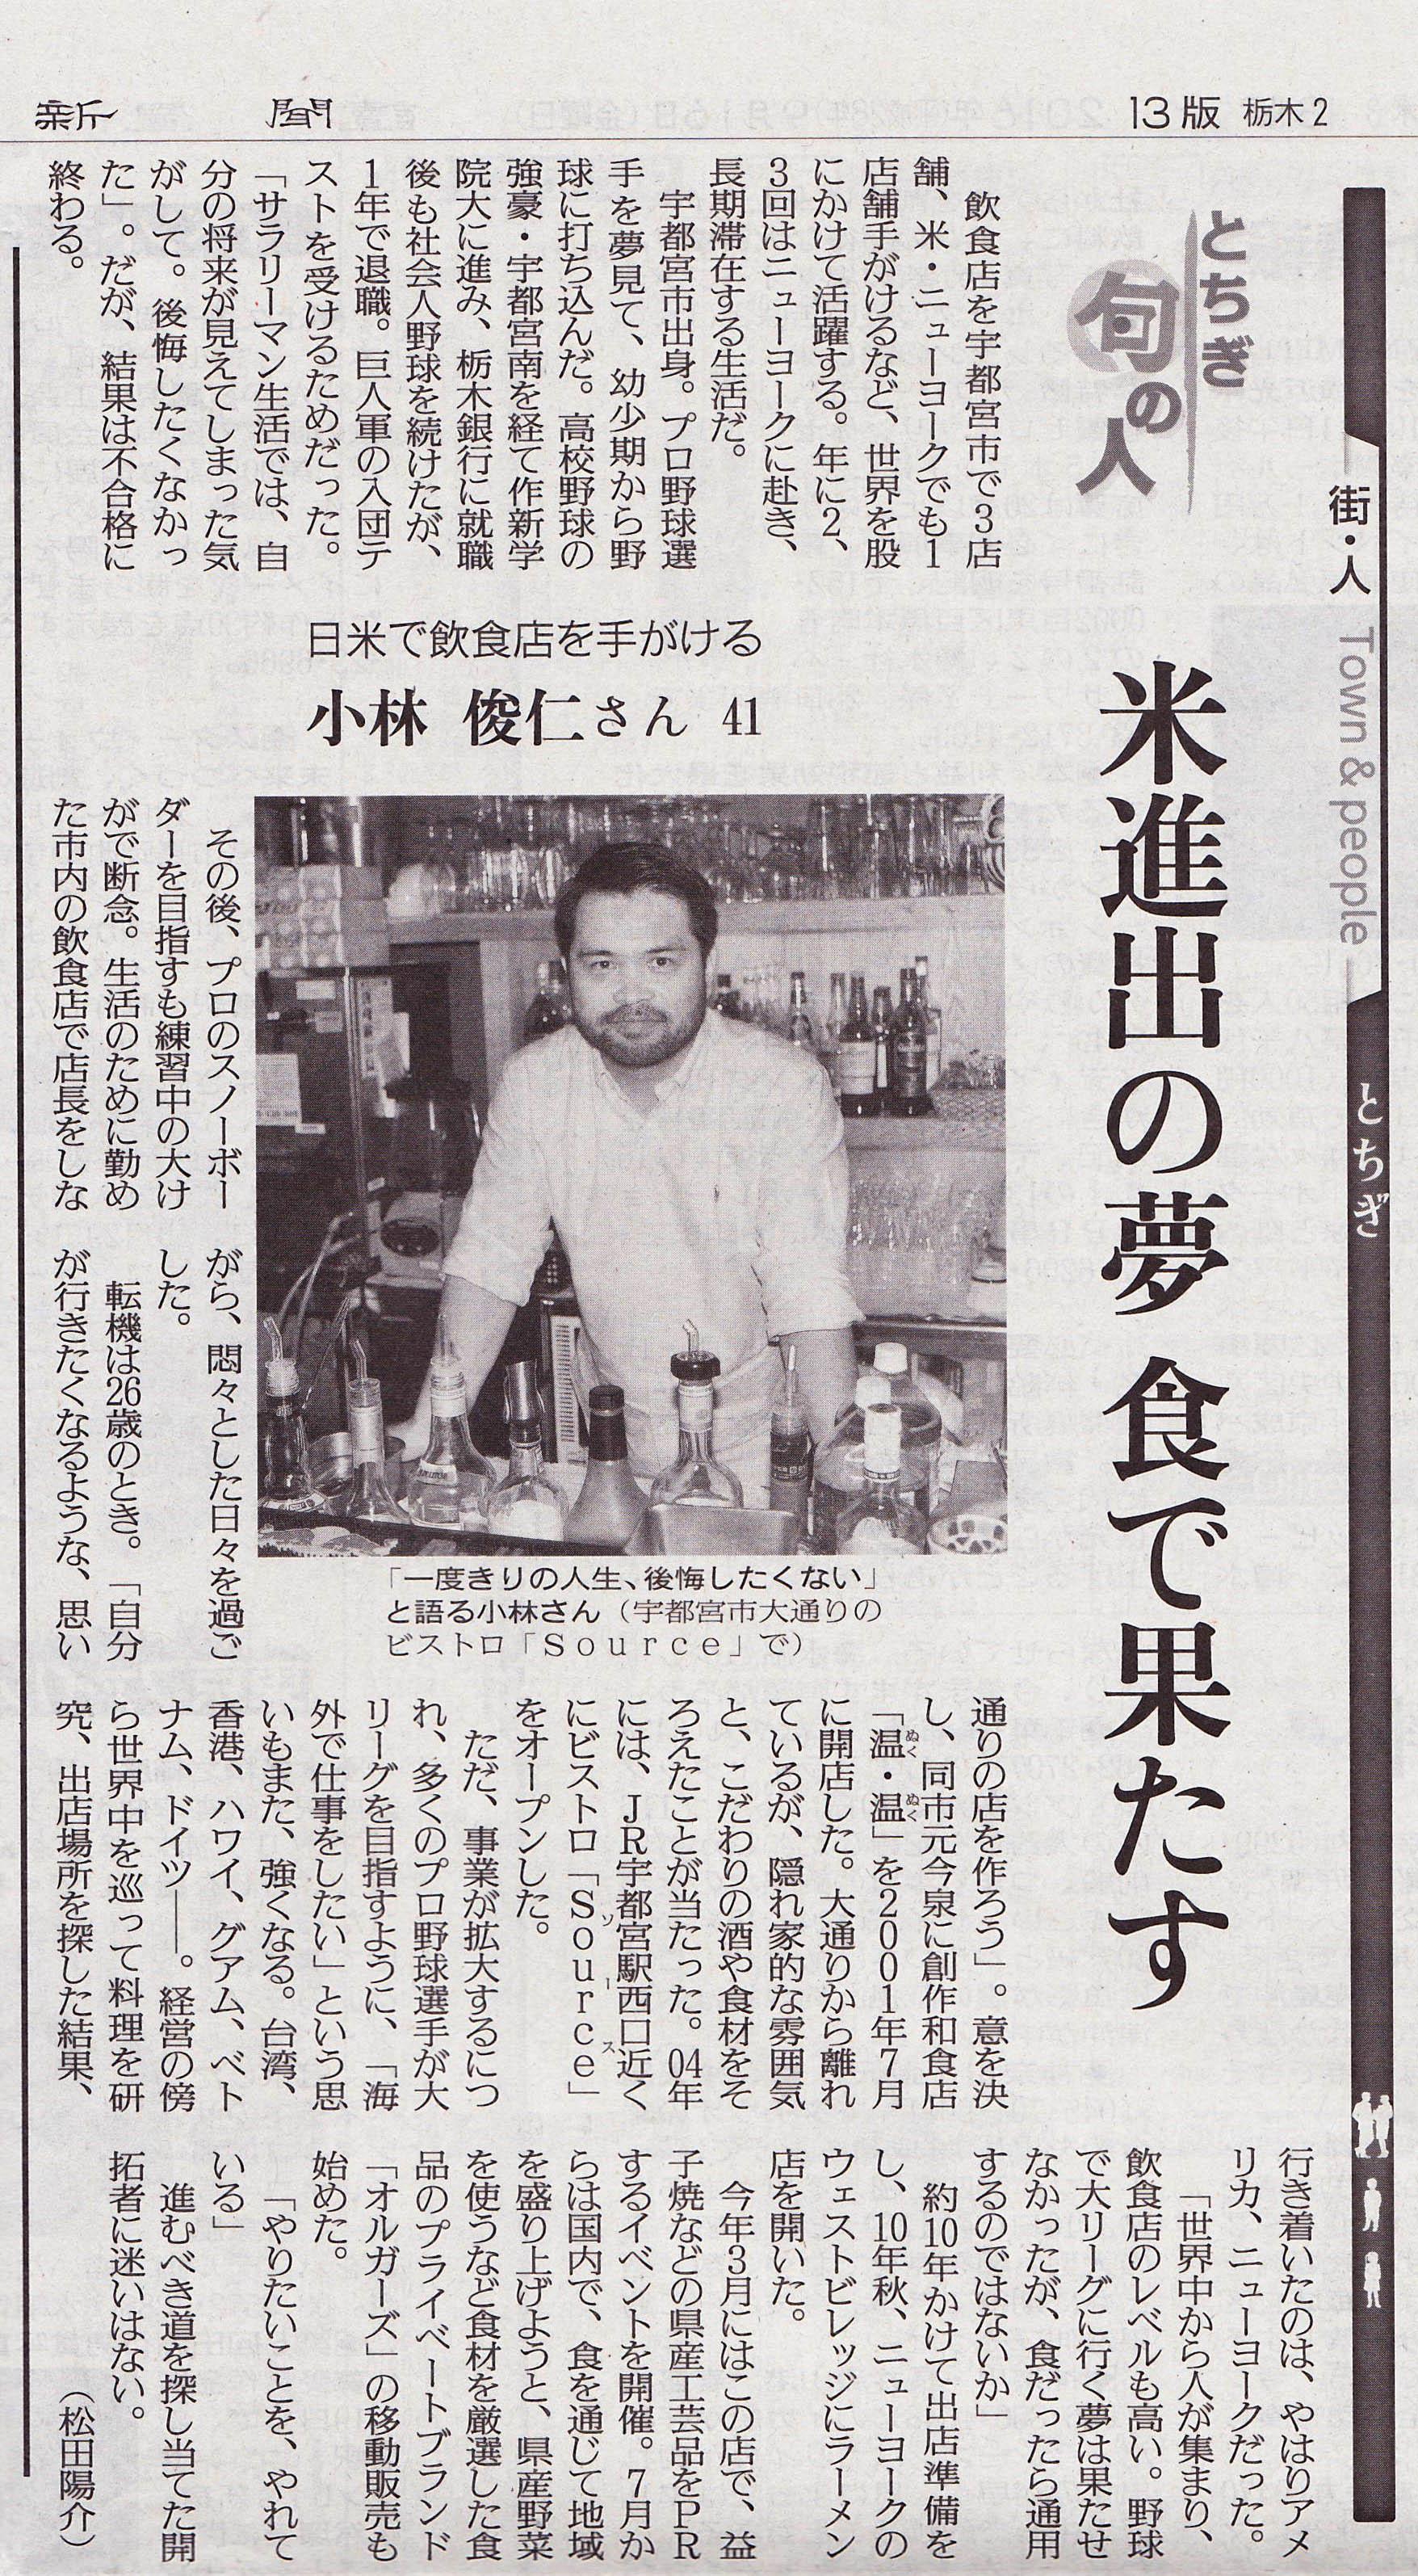 yomiurishinbun@toshihitokobayashi